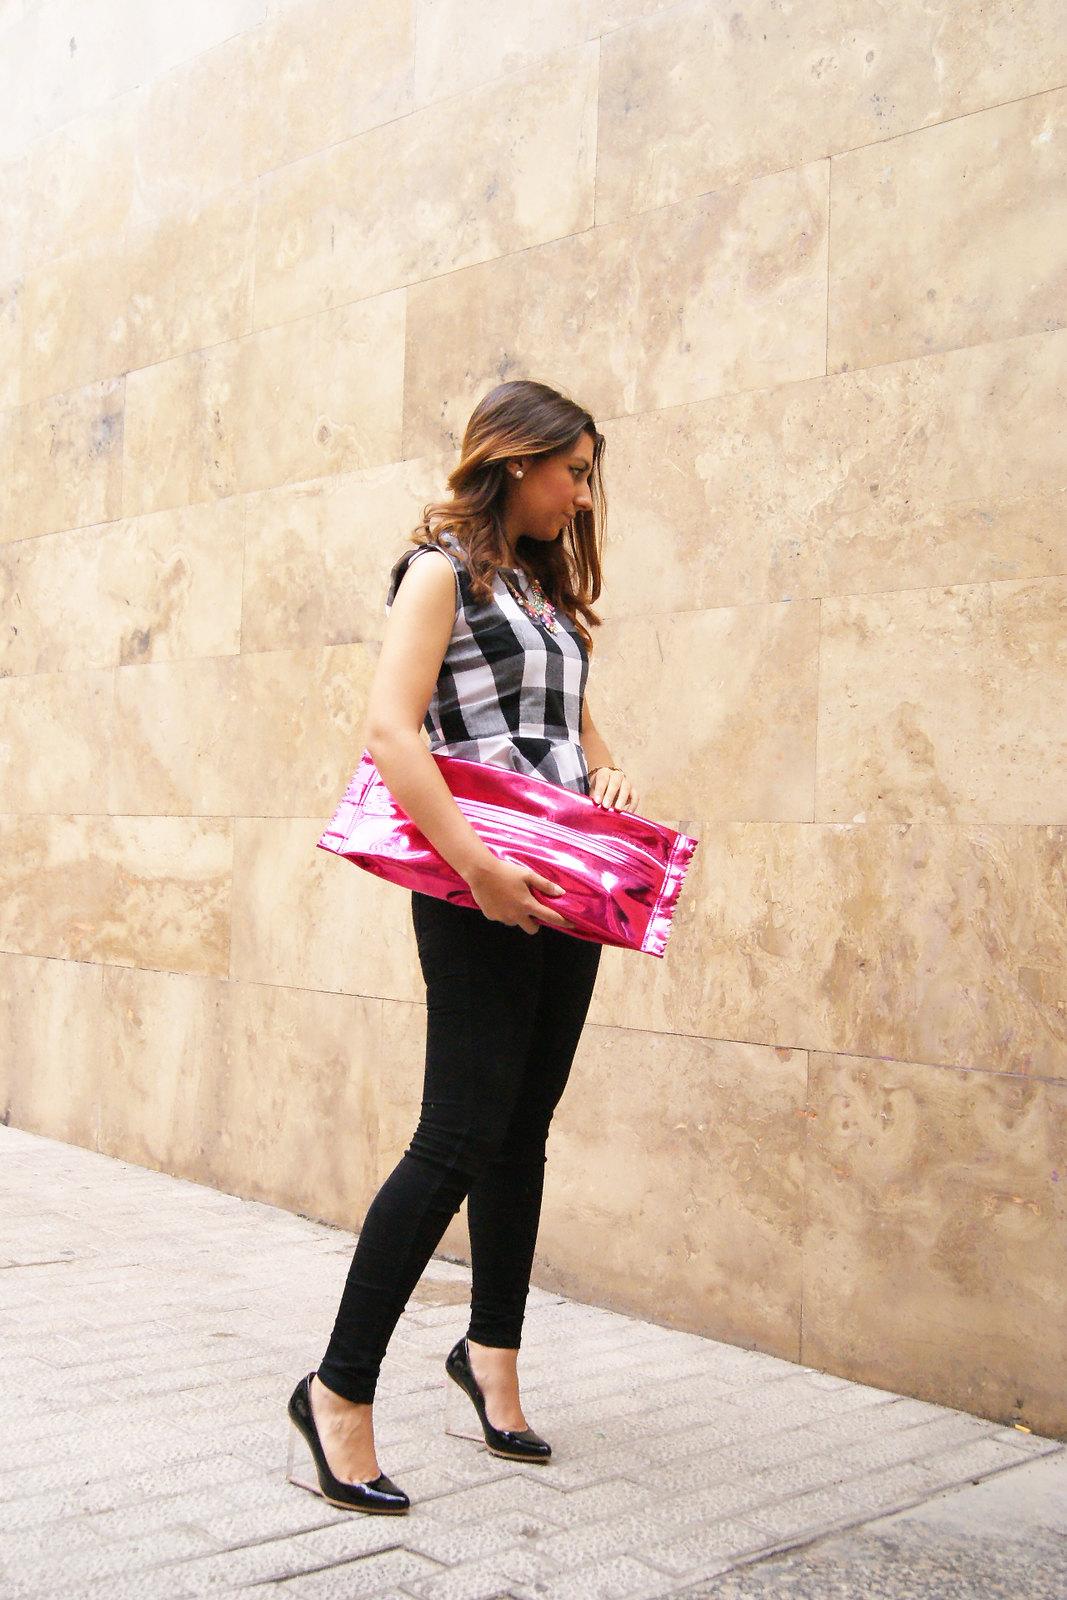 Glamourella margiela outfit post 1